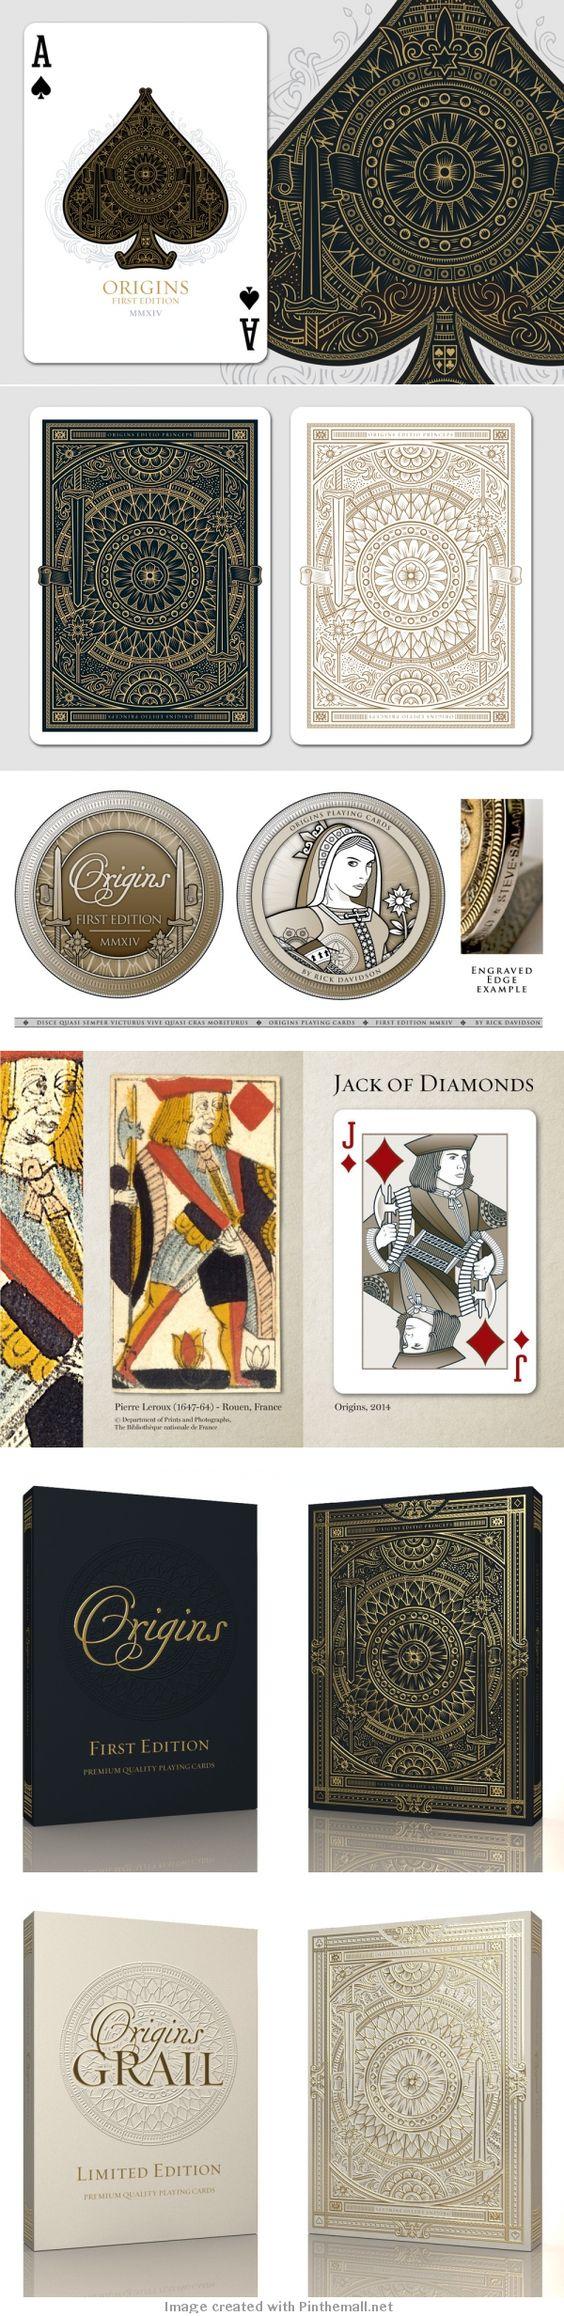 Origins Playing Cards